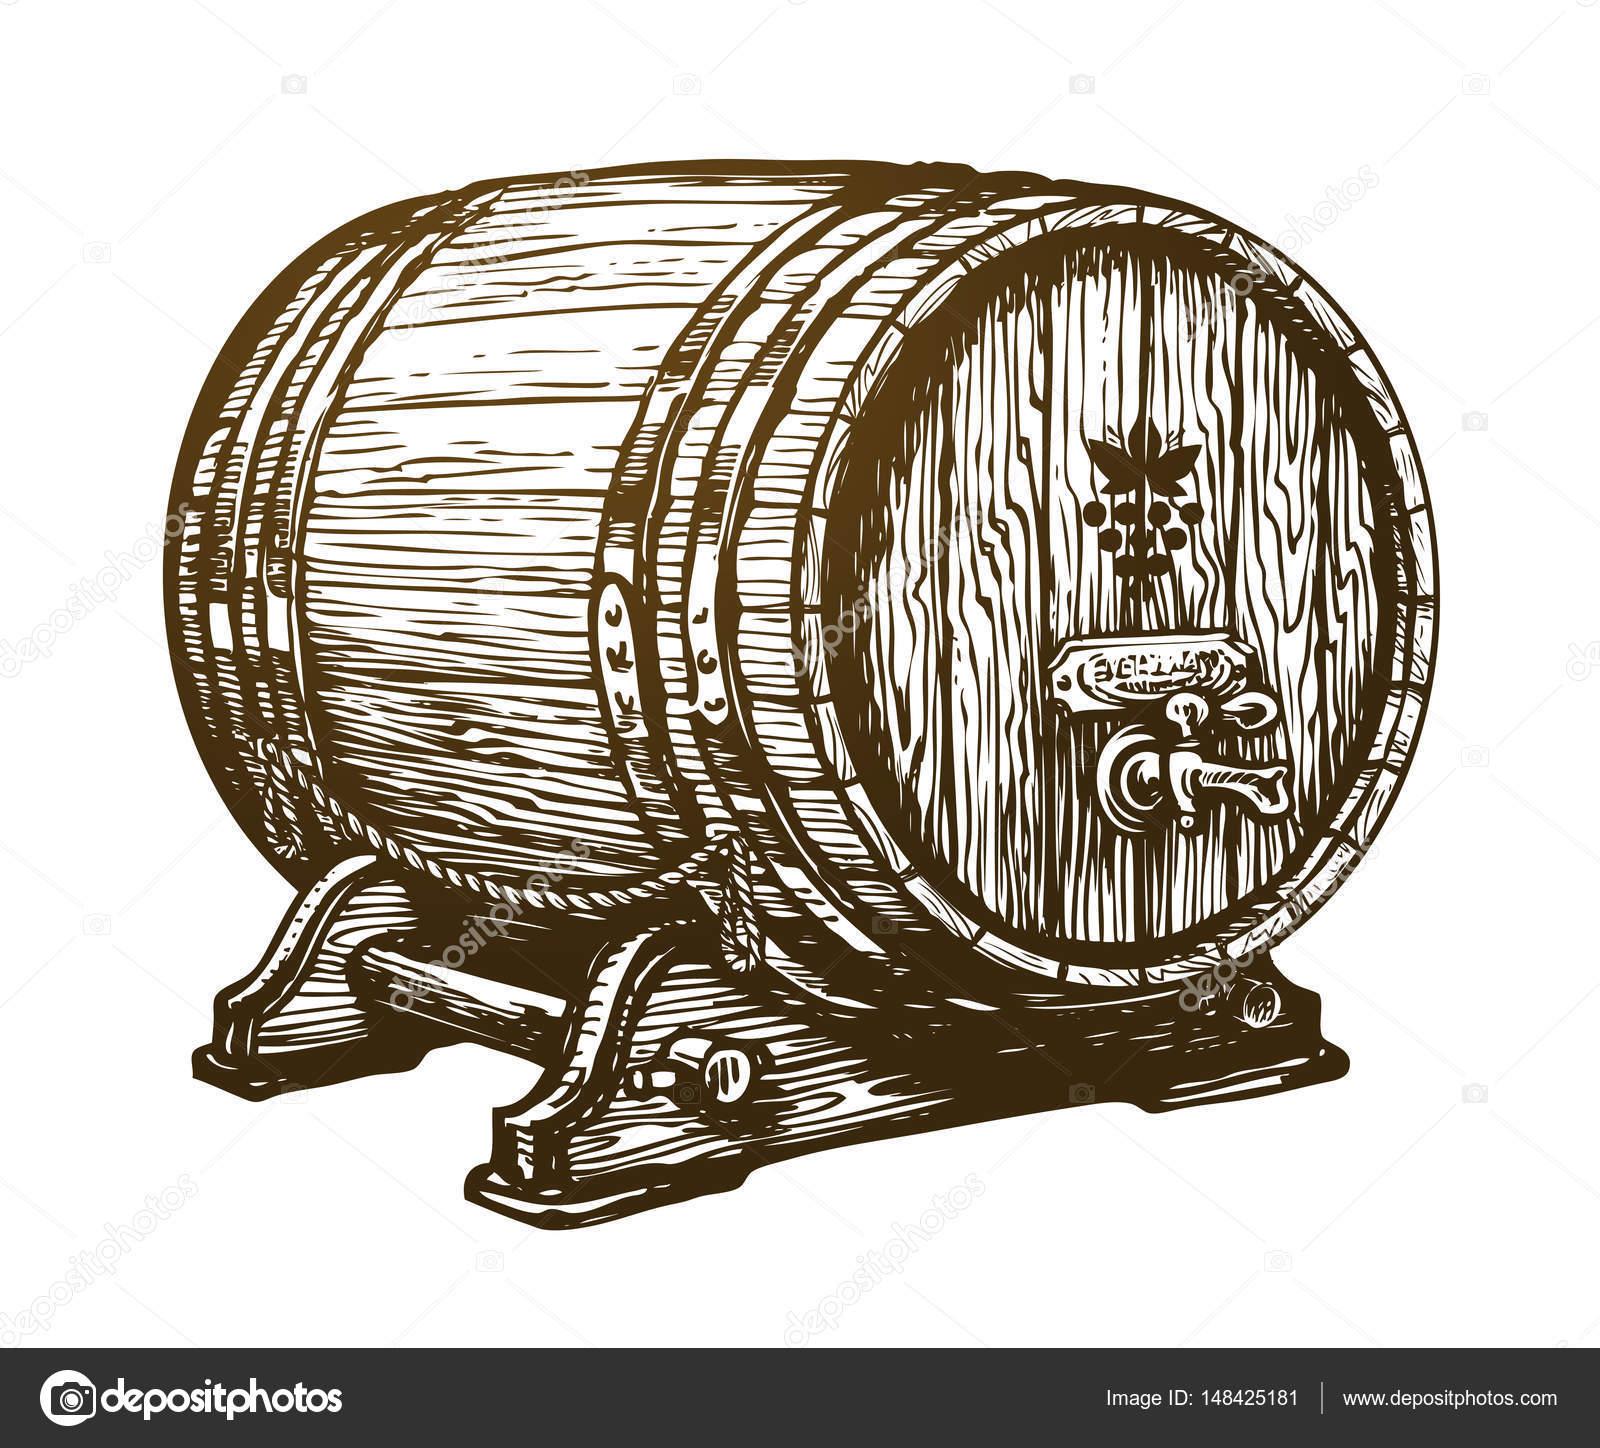 1600x1448 Hand Drawn Wooden Wine Cask. Drink, Oak Barrel Sketch. Vintage